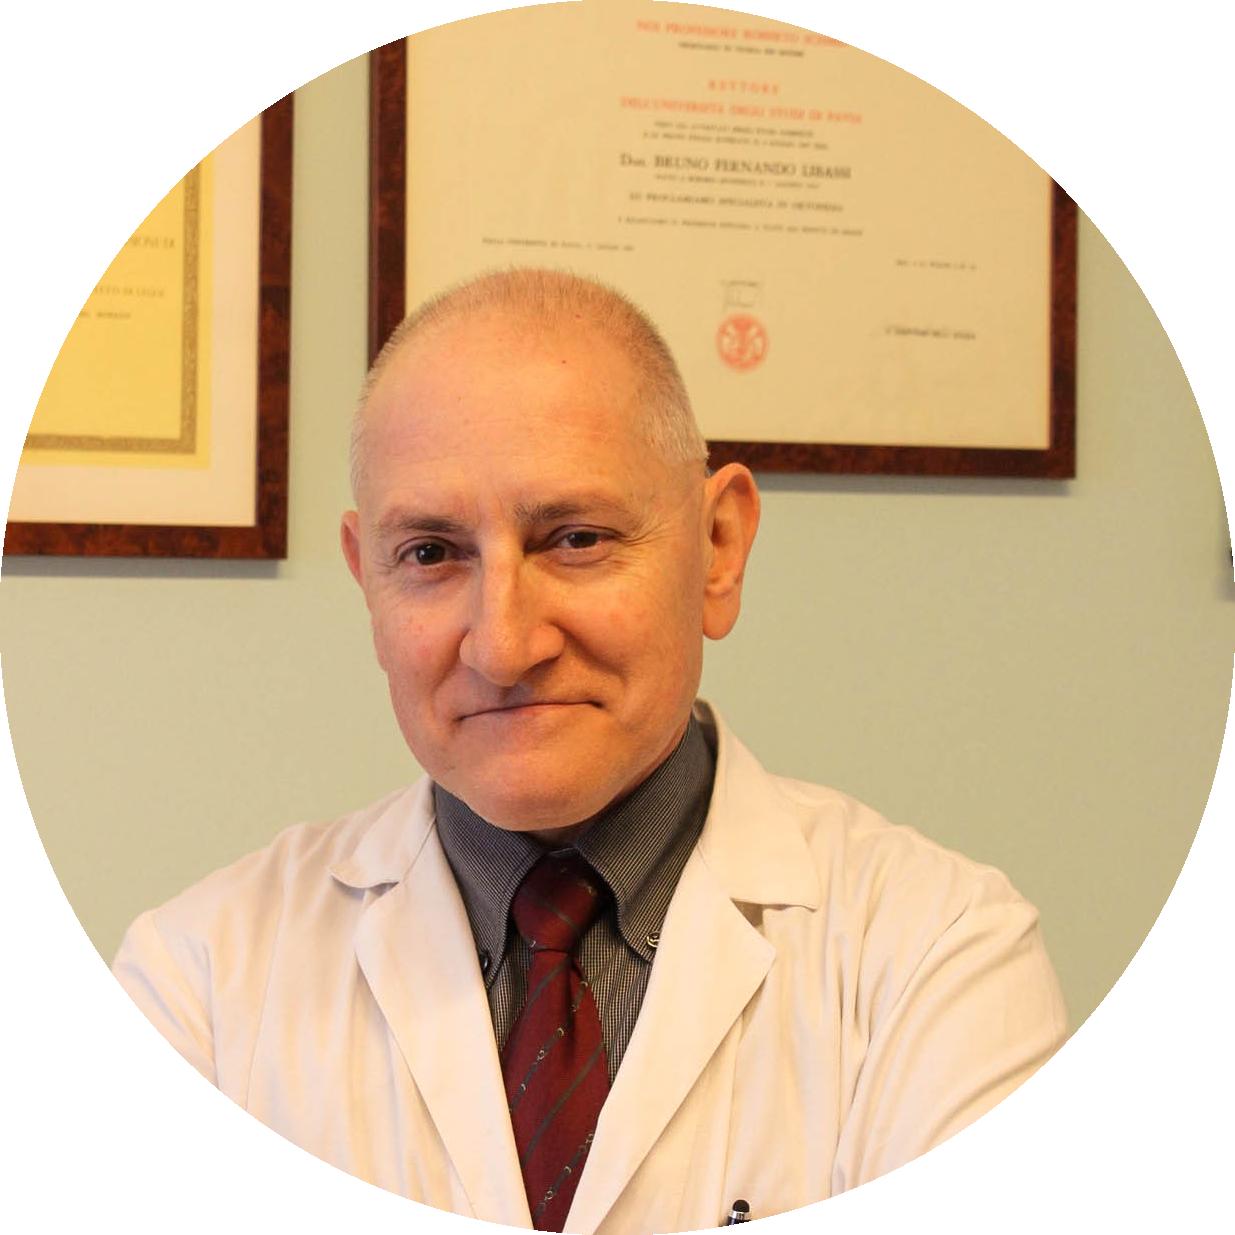 Dott. Bruno Fernando Libassi